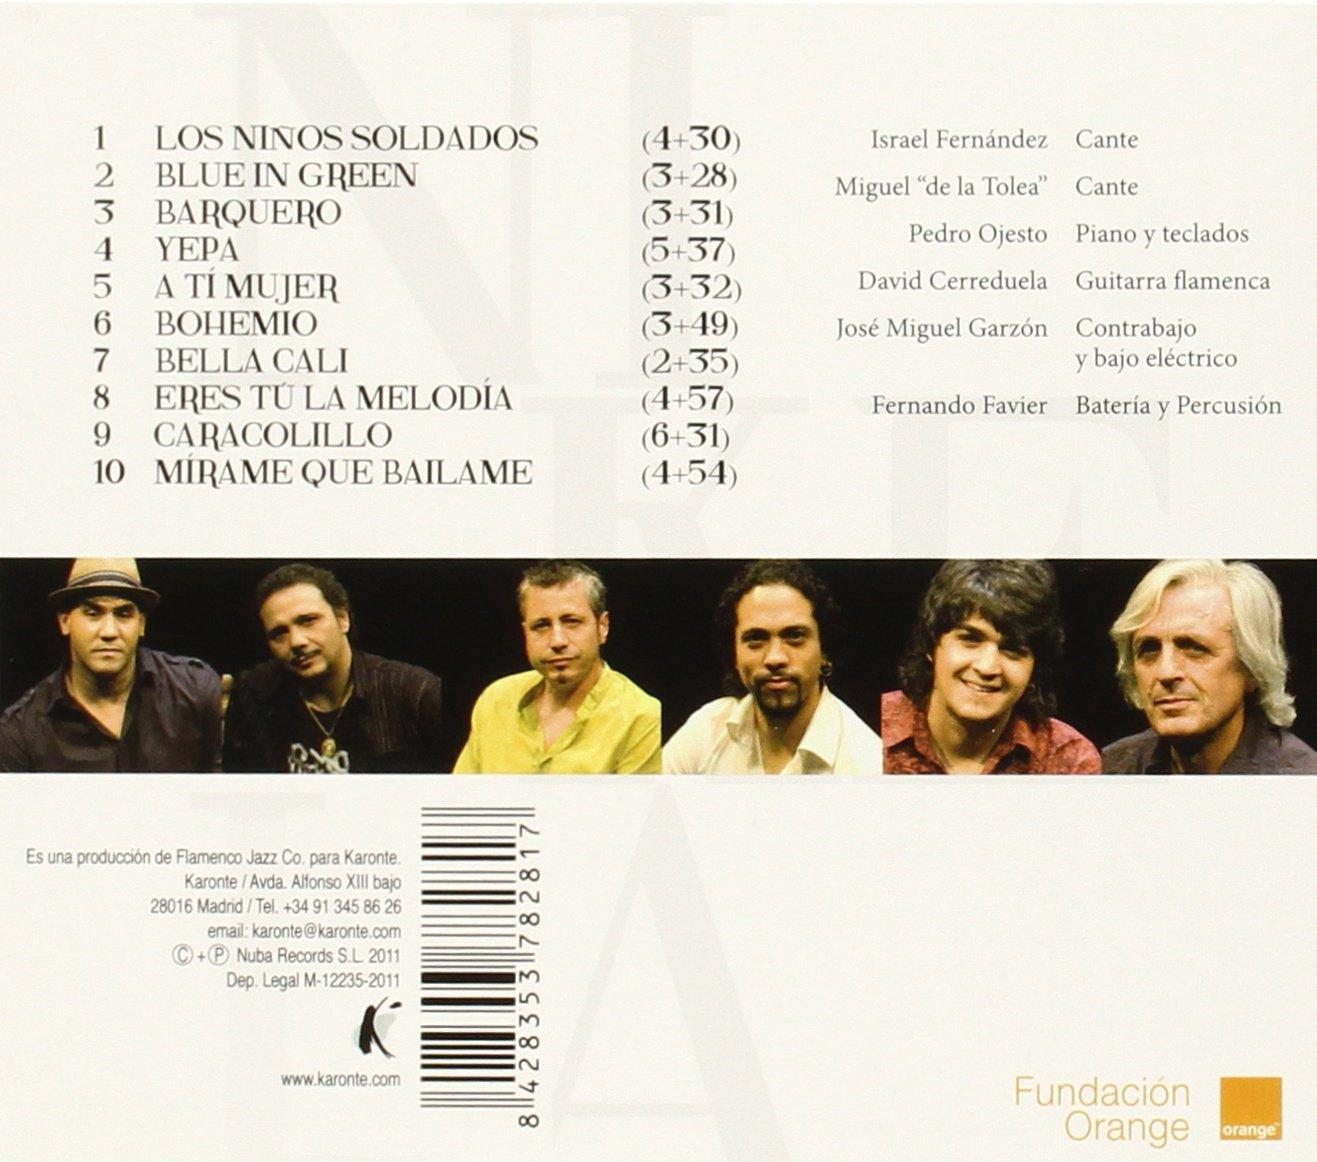 Nikela: Flamenco Jazz Company: Amazon.es: Música